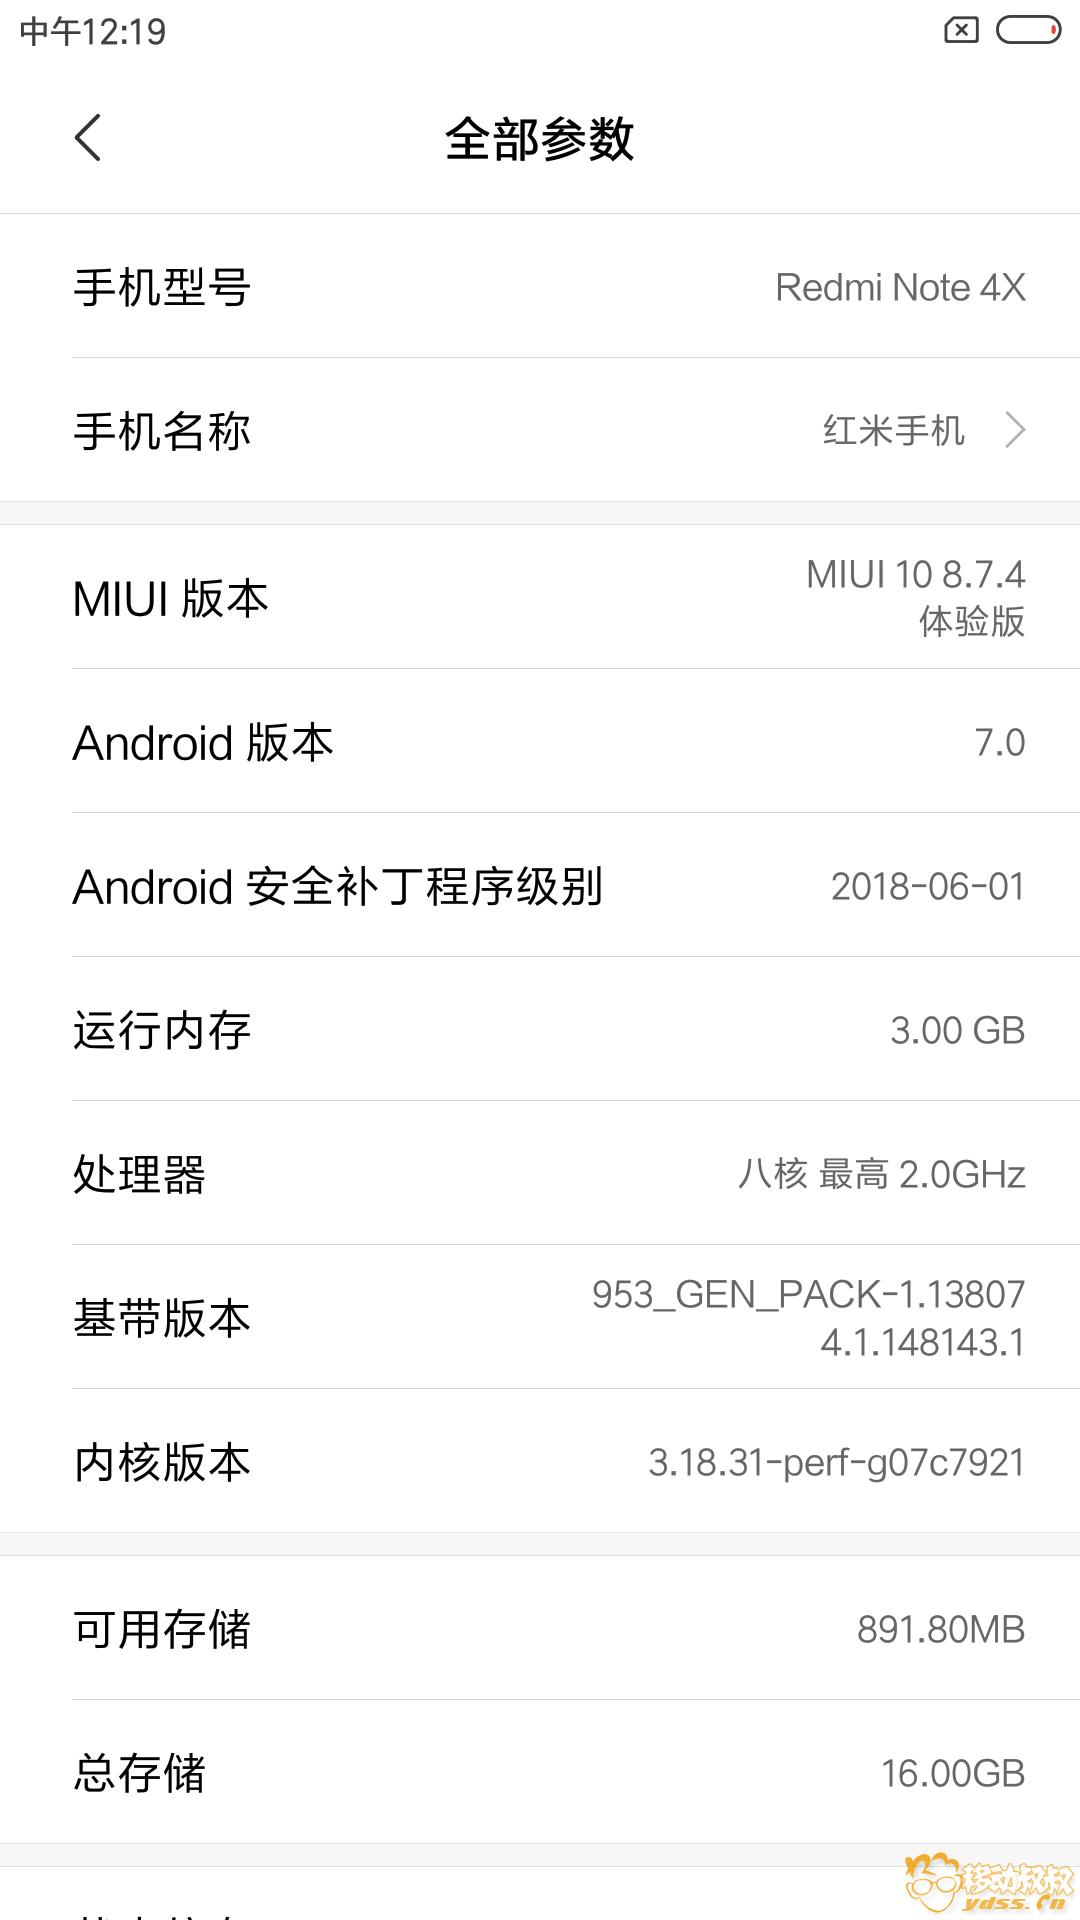 Screenshot_2018-07-05-12-19-23-755_com.android.settings.png